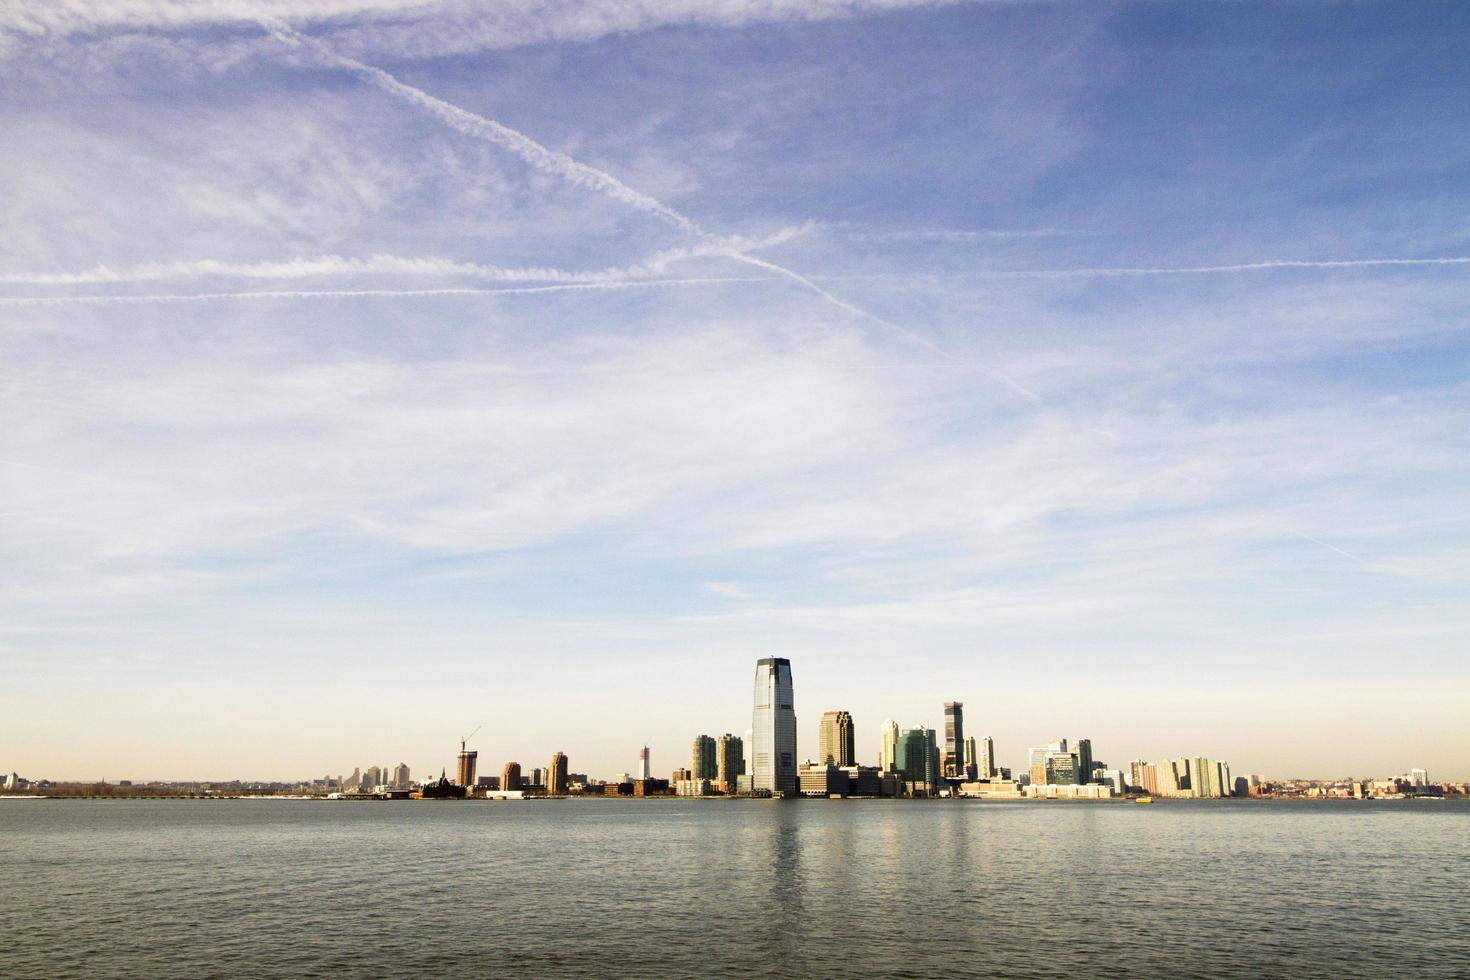 New York skyline at sunset photo